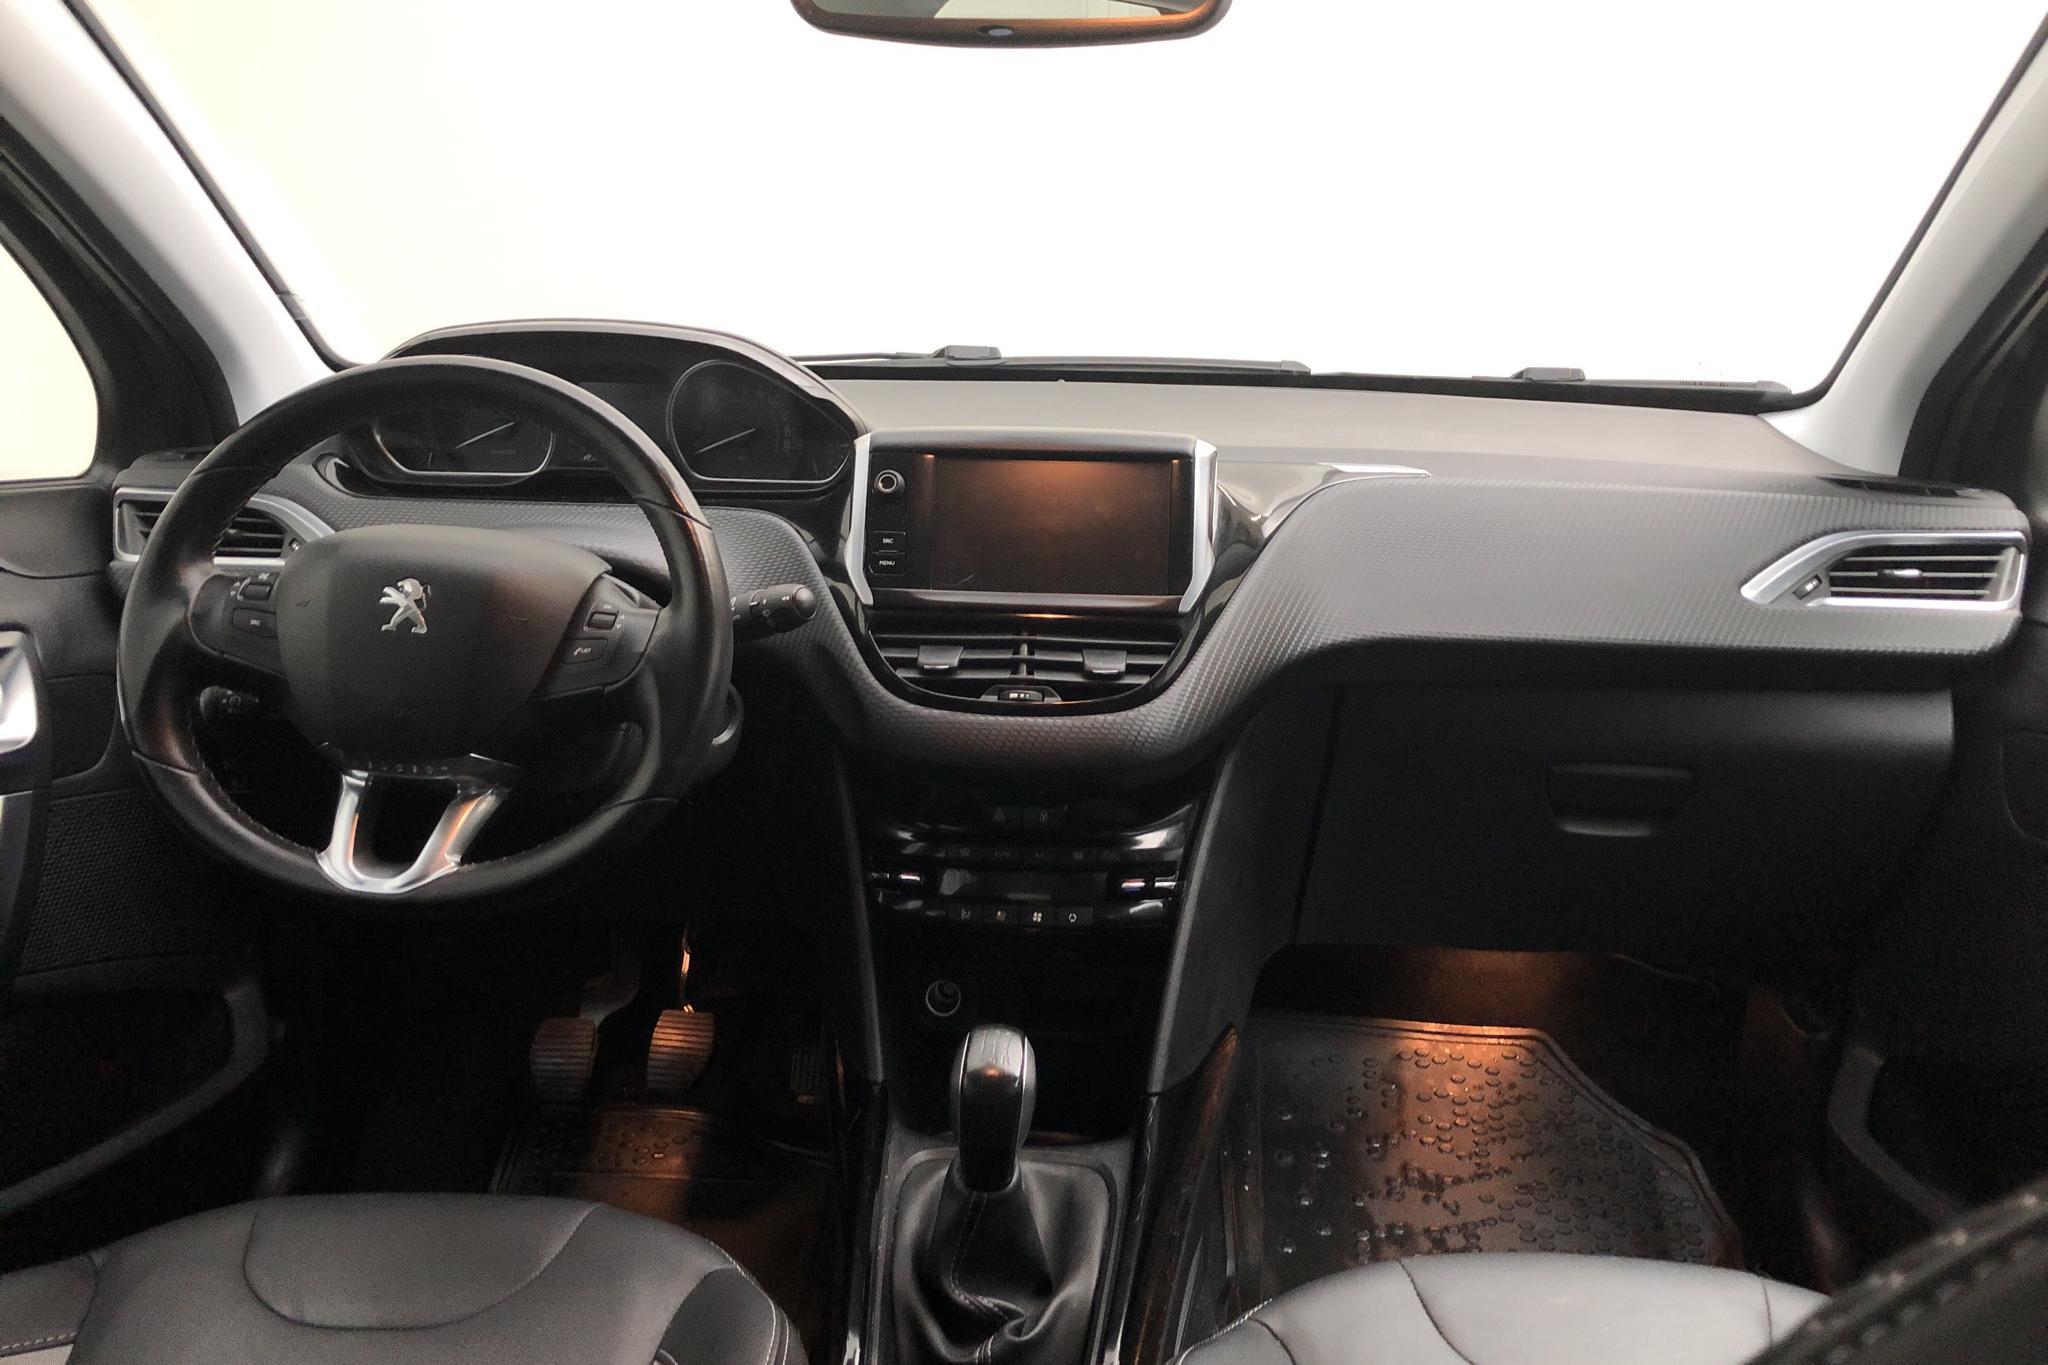 Peugeot 2008 1.2 VTi (82hk) - 33 020 km - Manual - Dark Grey - 2018